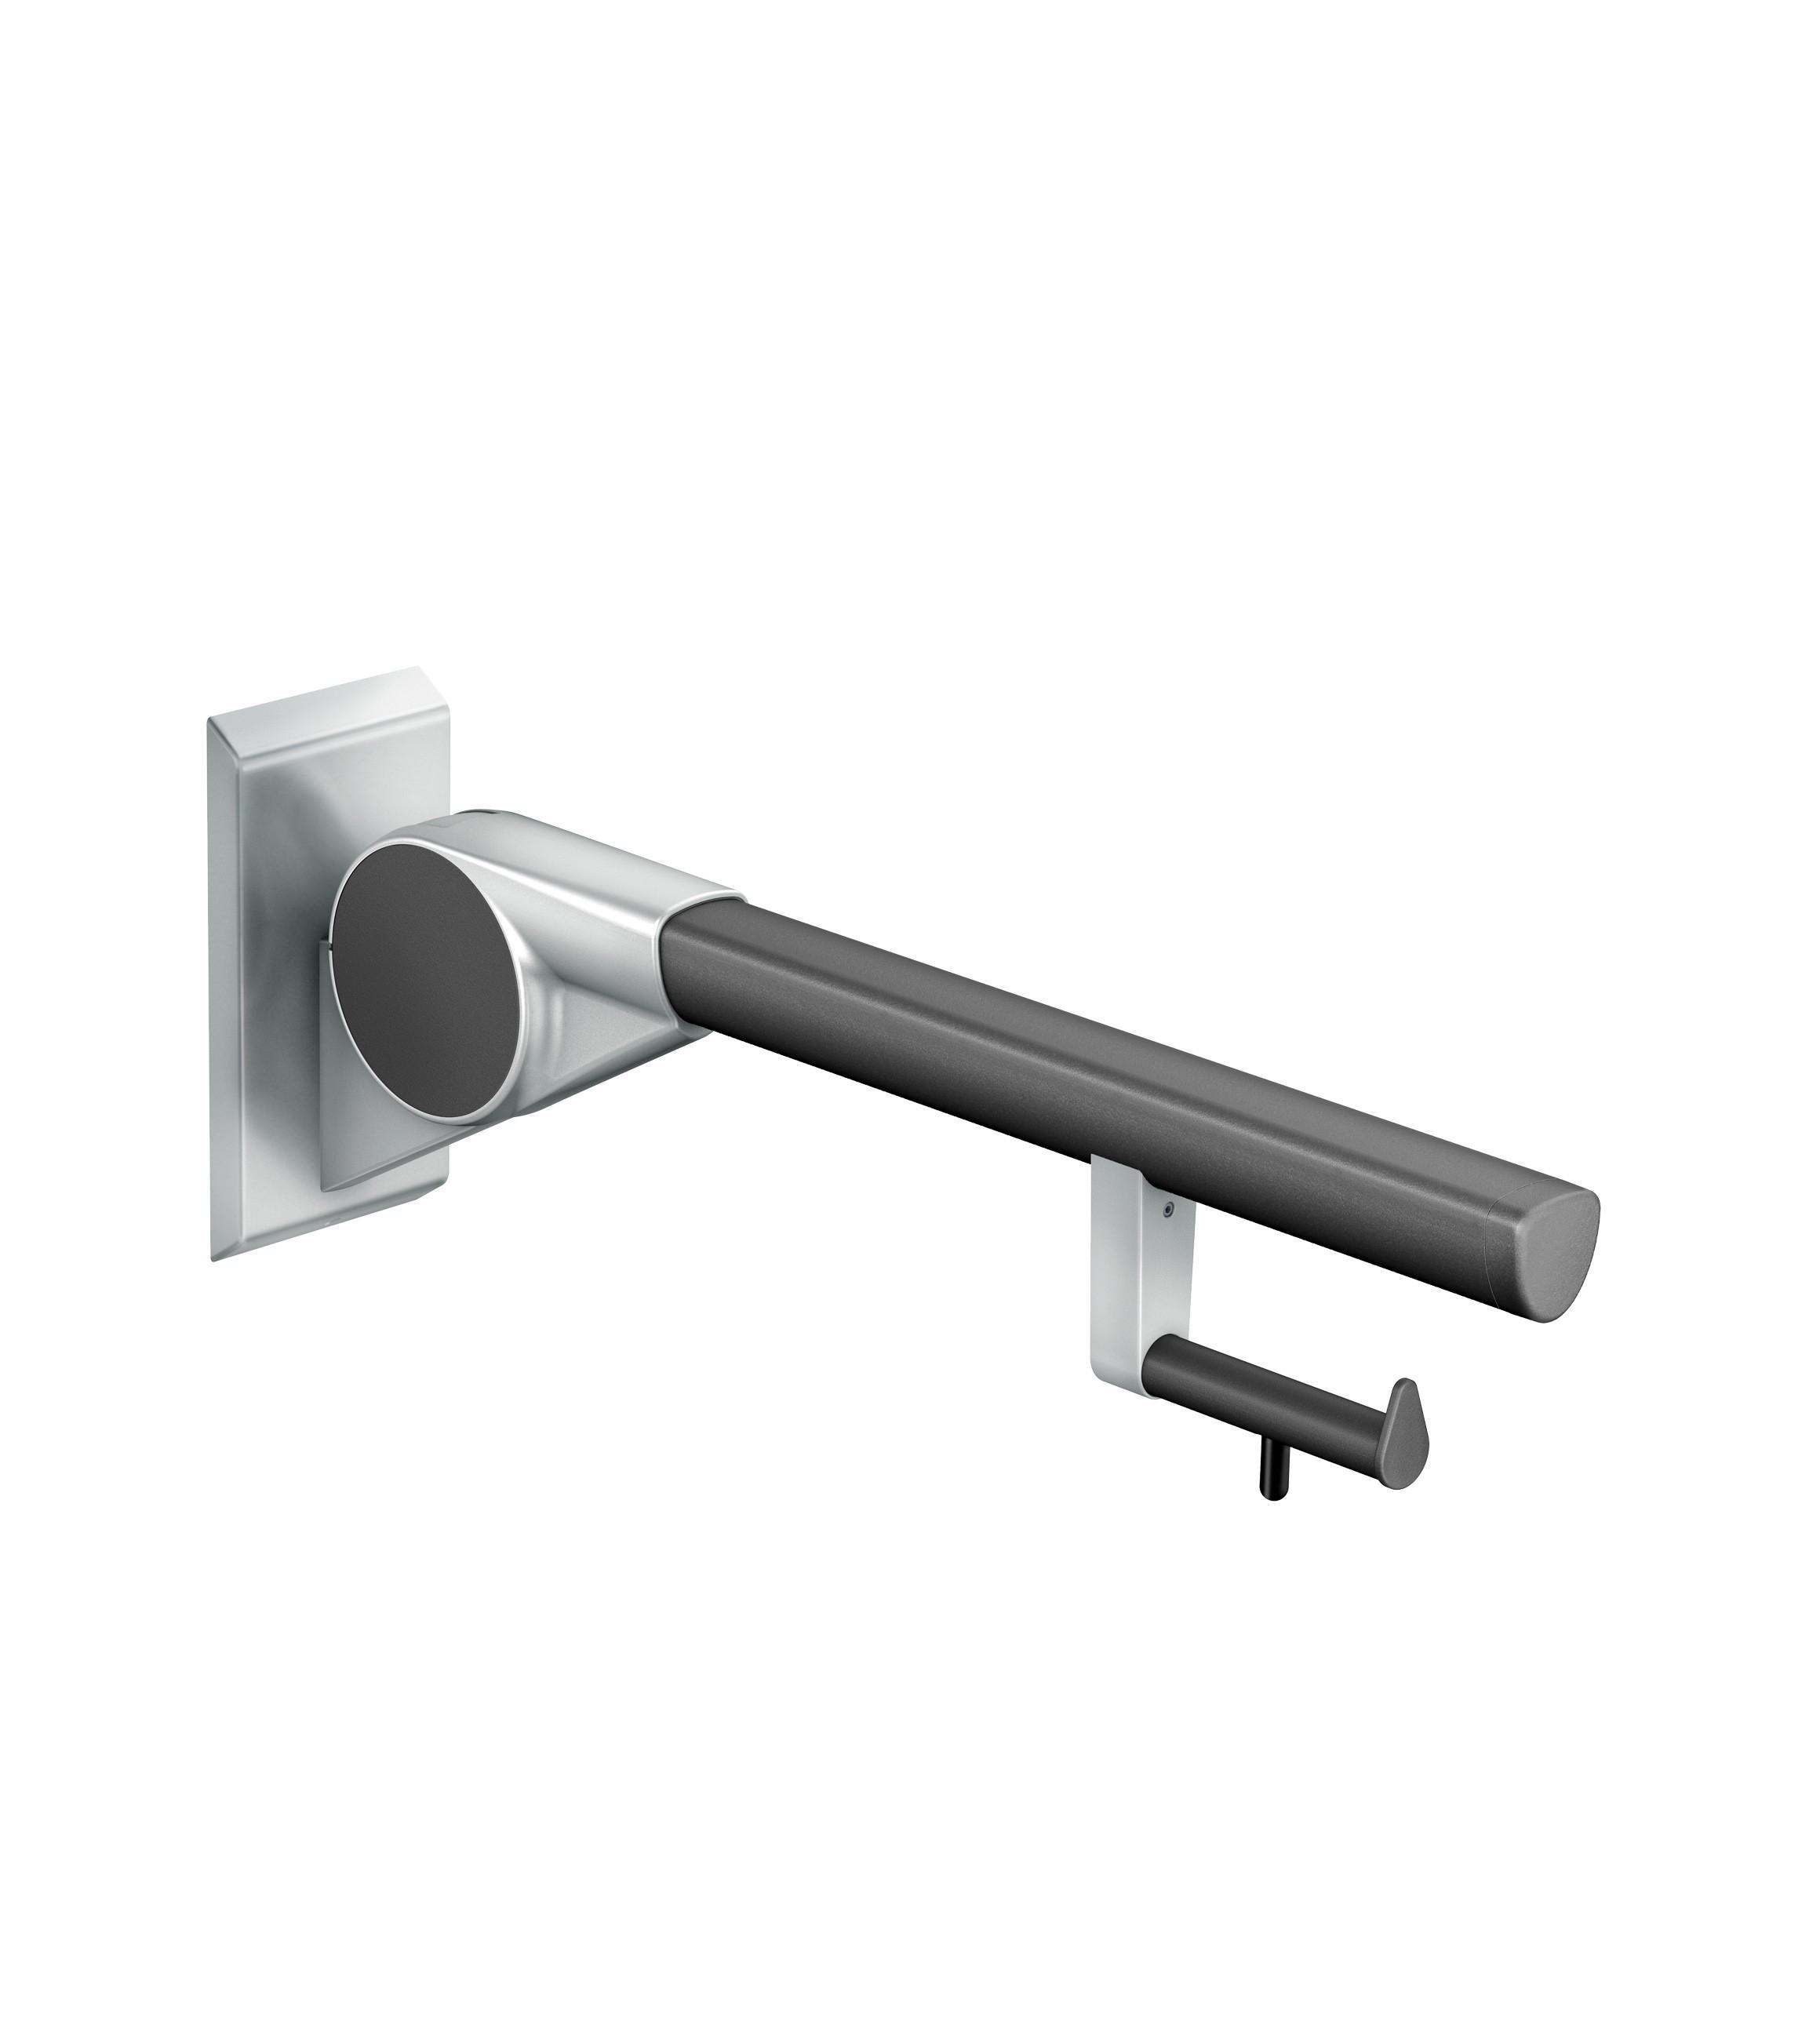 FSB Stützklappgriff 700 mm mit PRH A100 Anthrazitgrau metallinksc (0 82 8420 01070 8809)